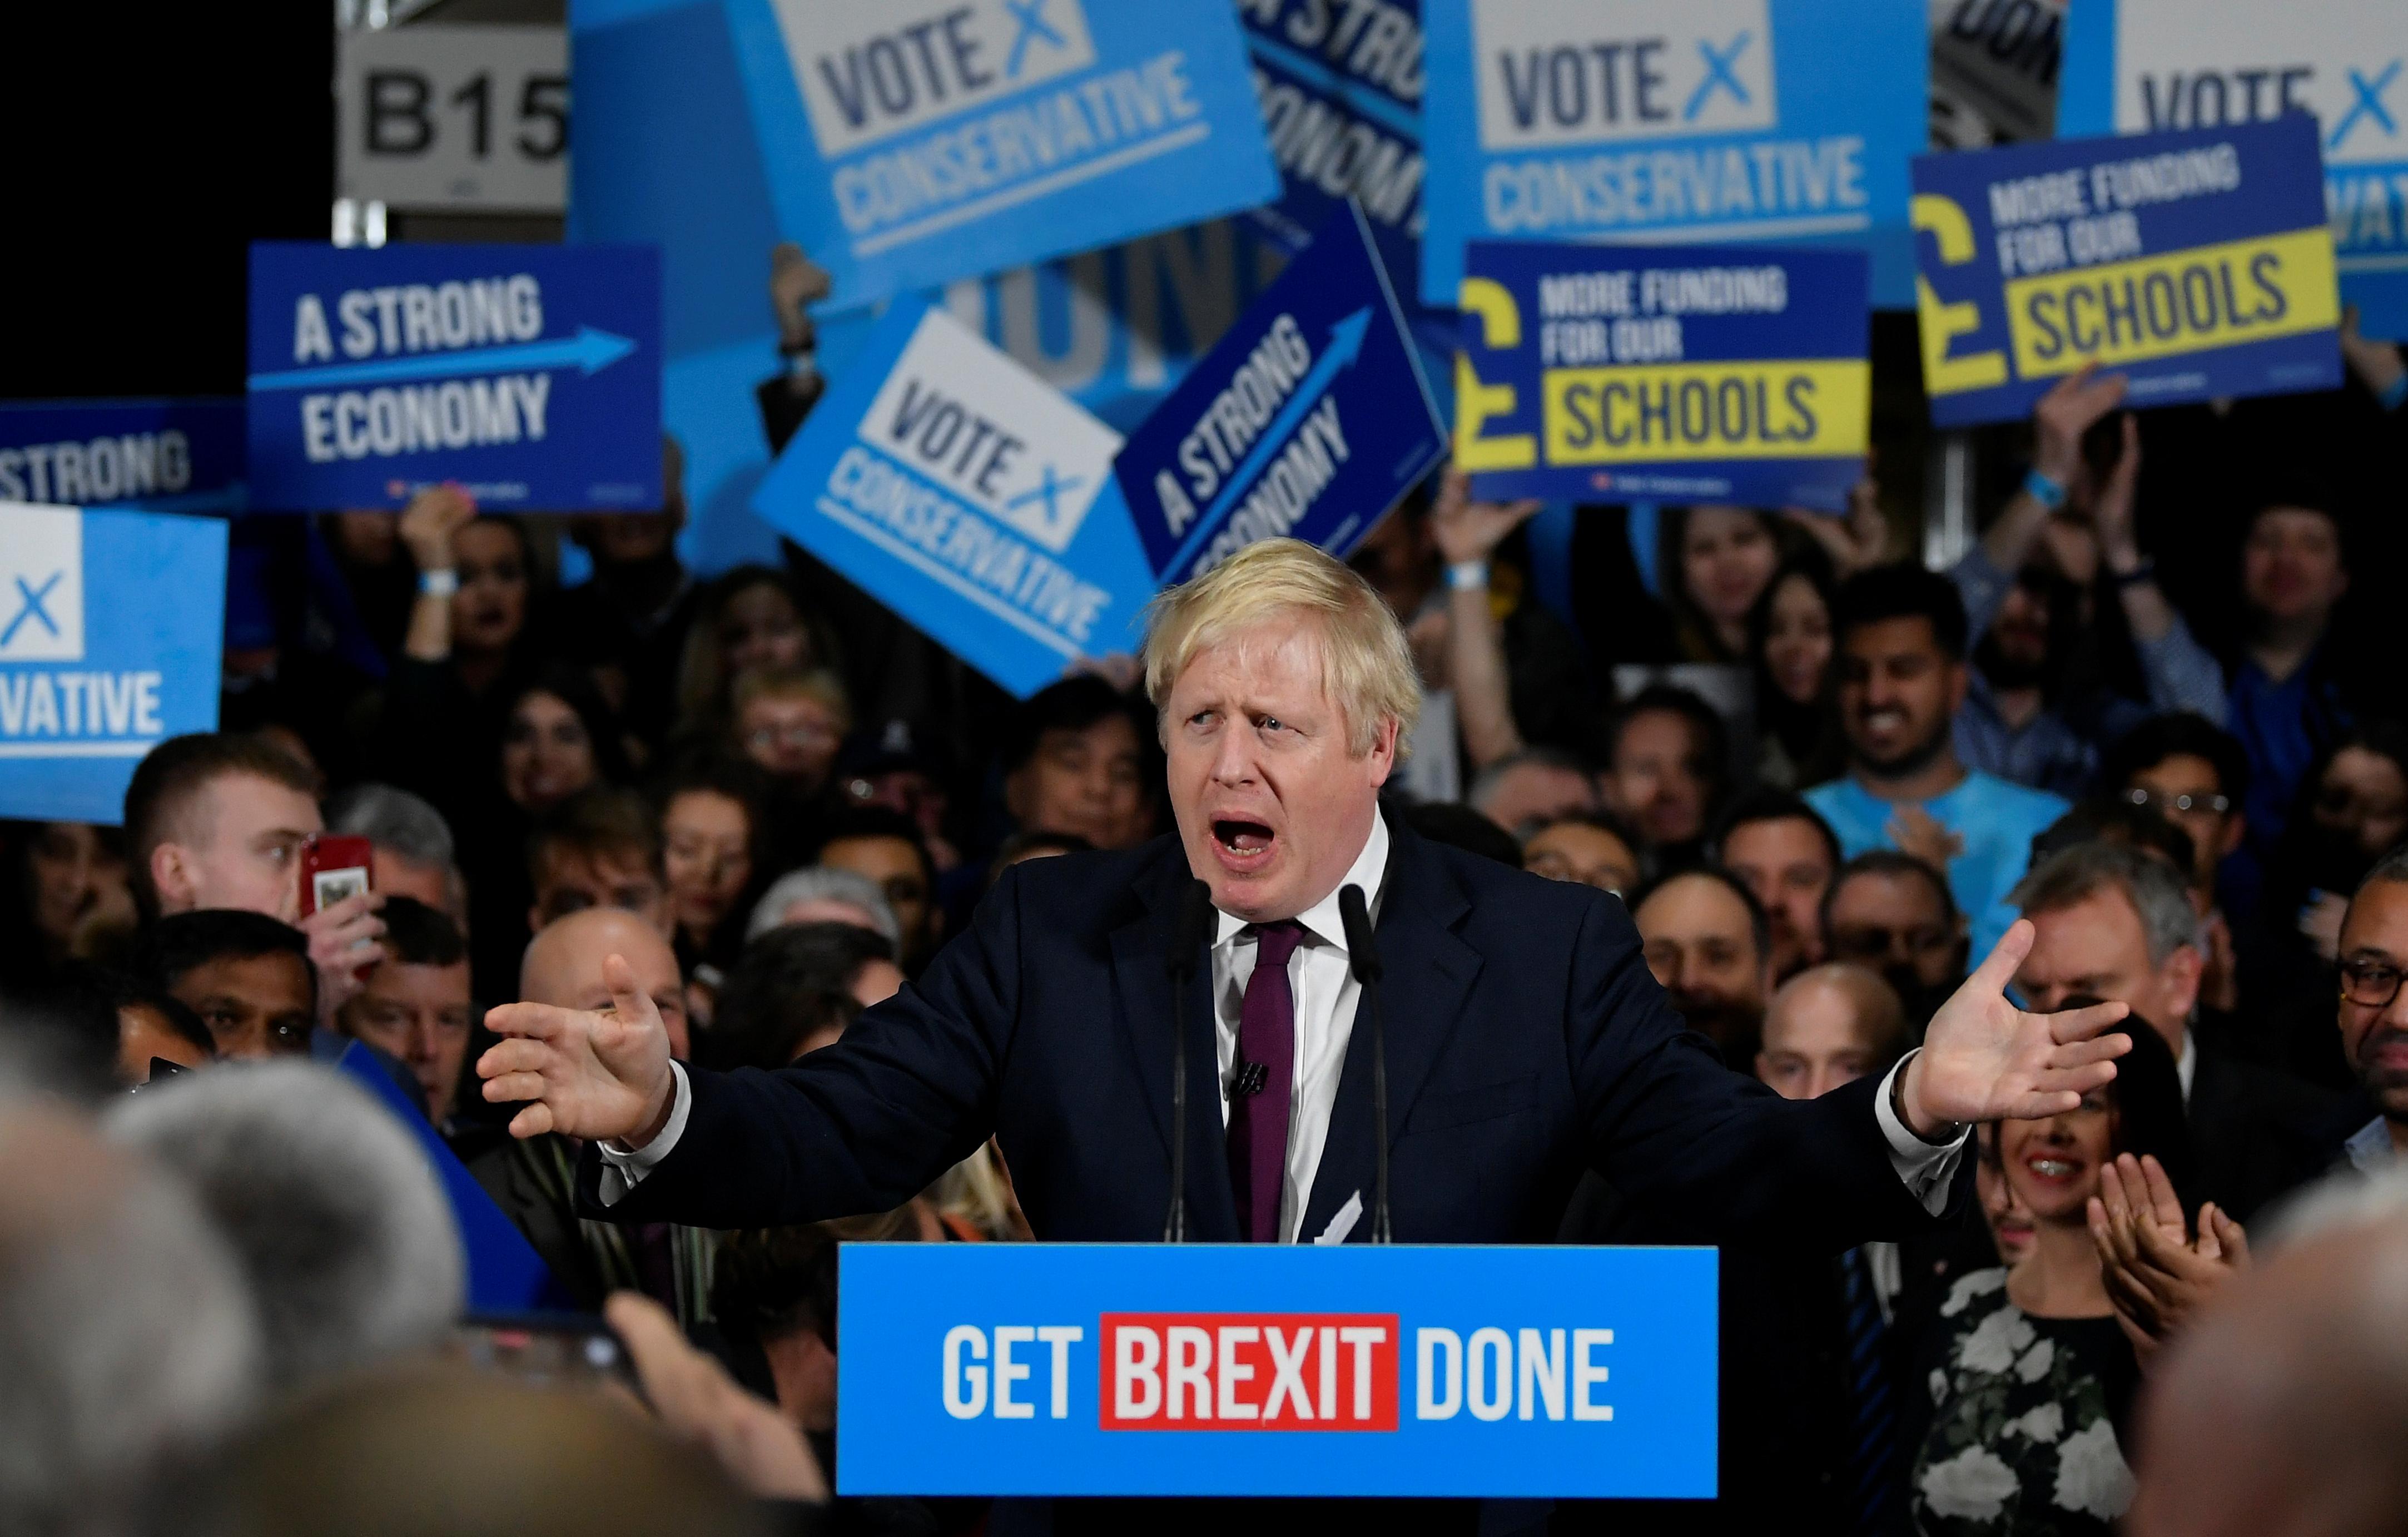 UK's Johnson on track for 24-seat majority: Focaldata